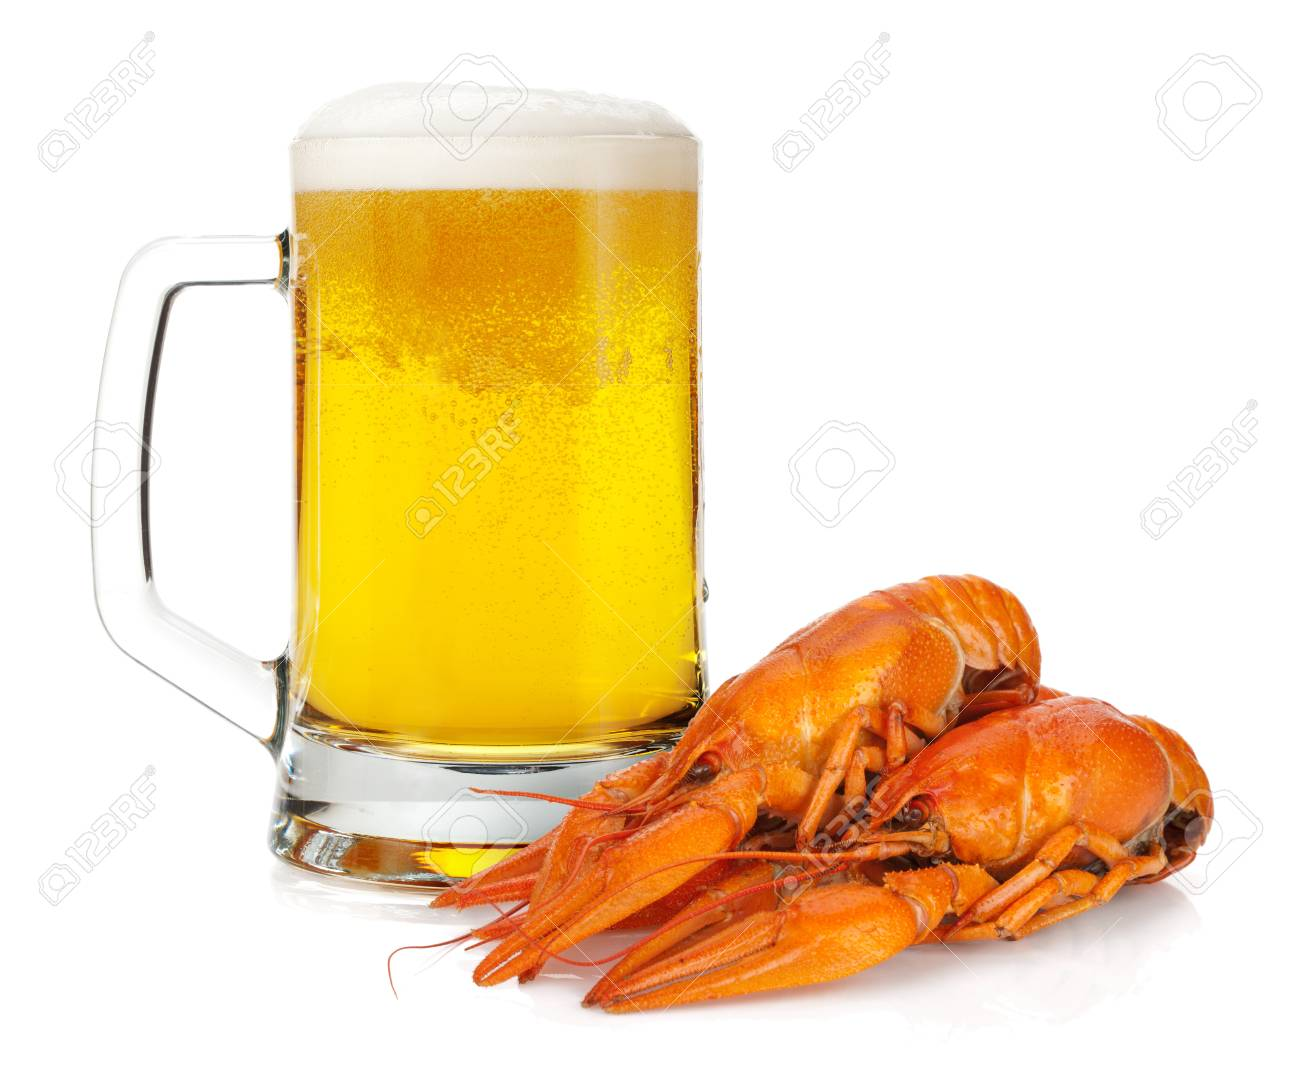 Beer mug and boiled crayfishes  Isolated on white background Stock Photo - 15715315